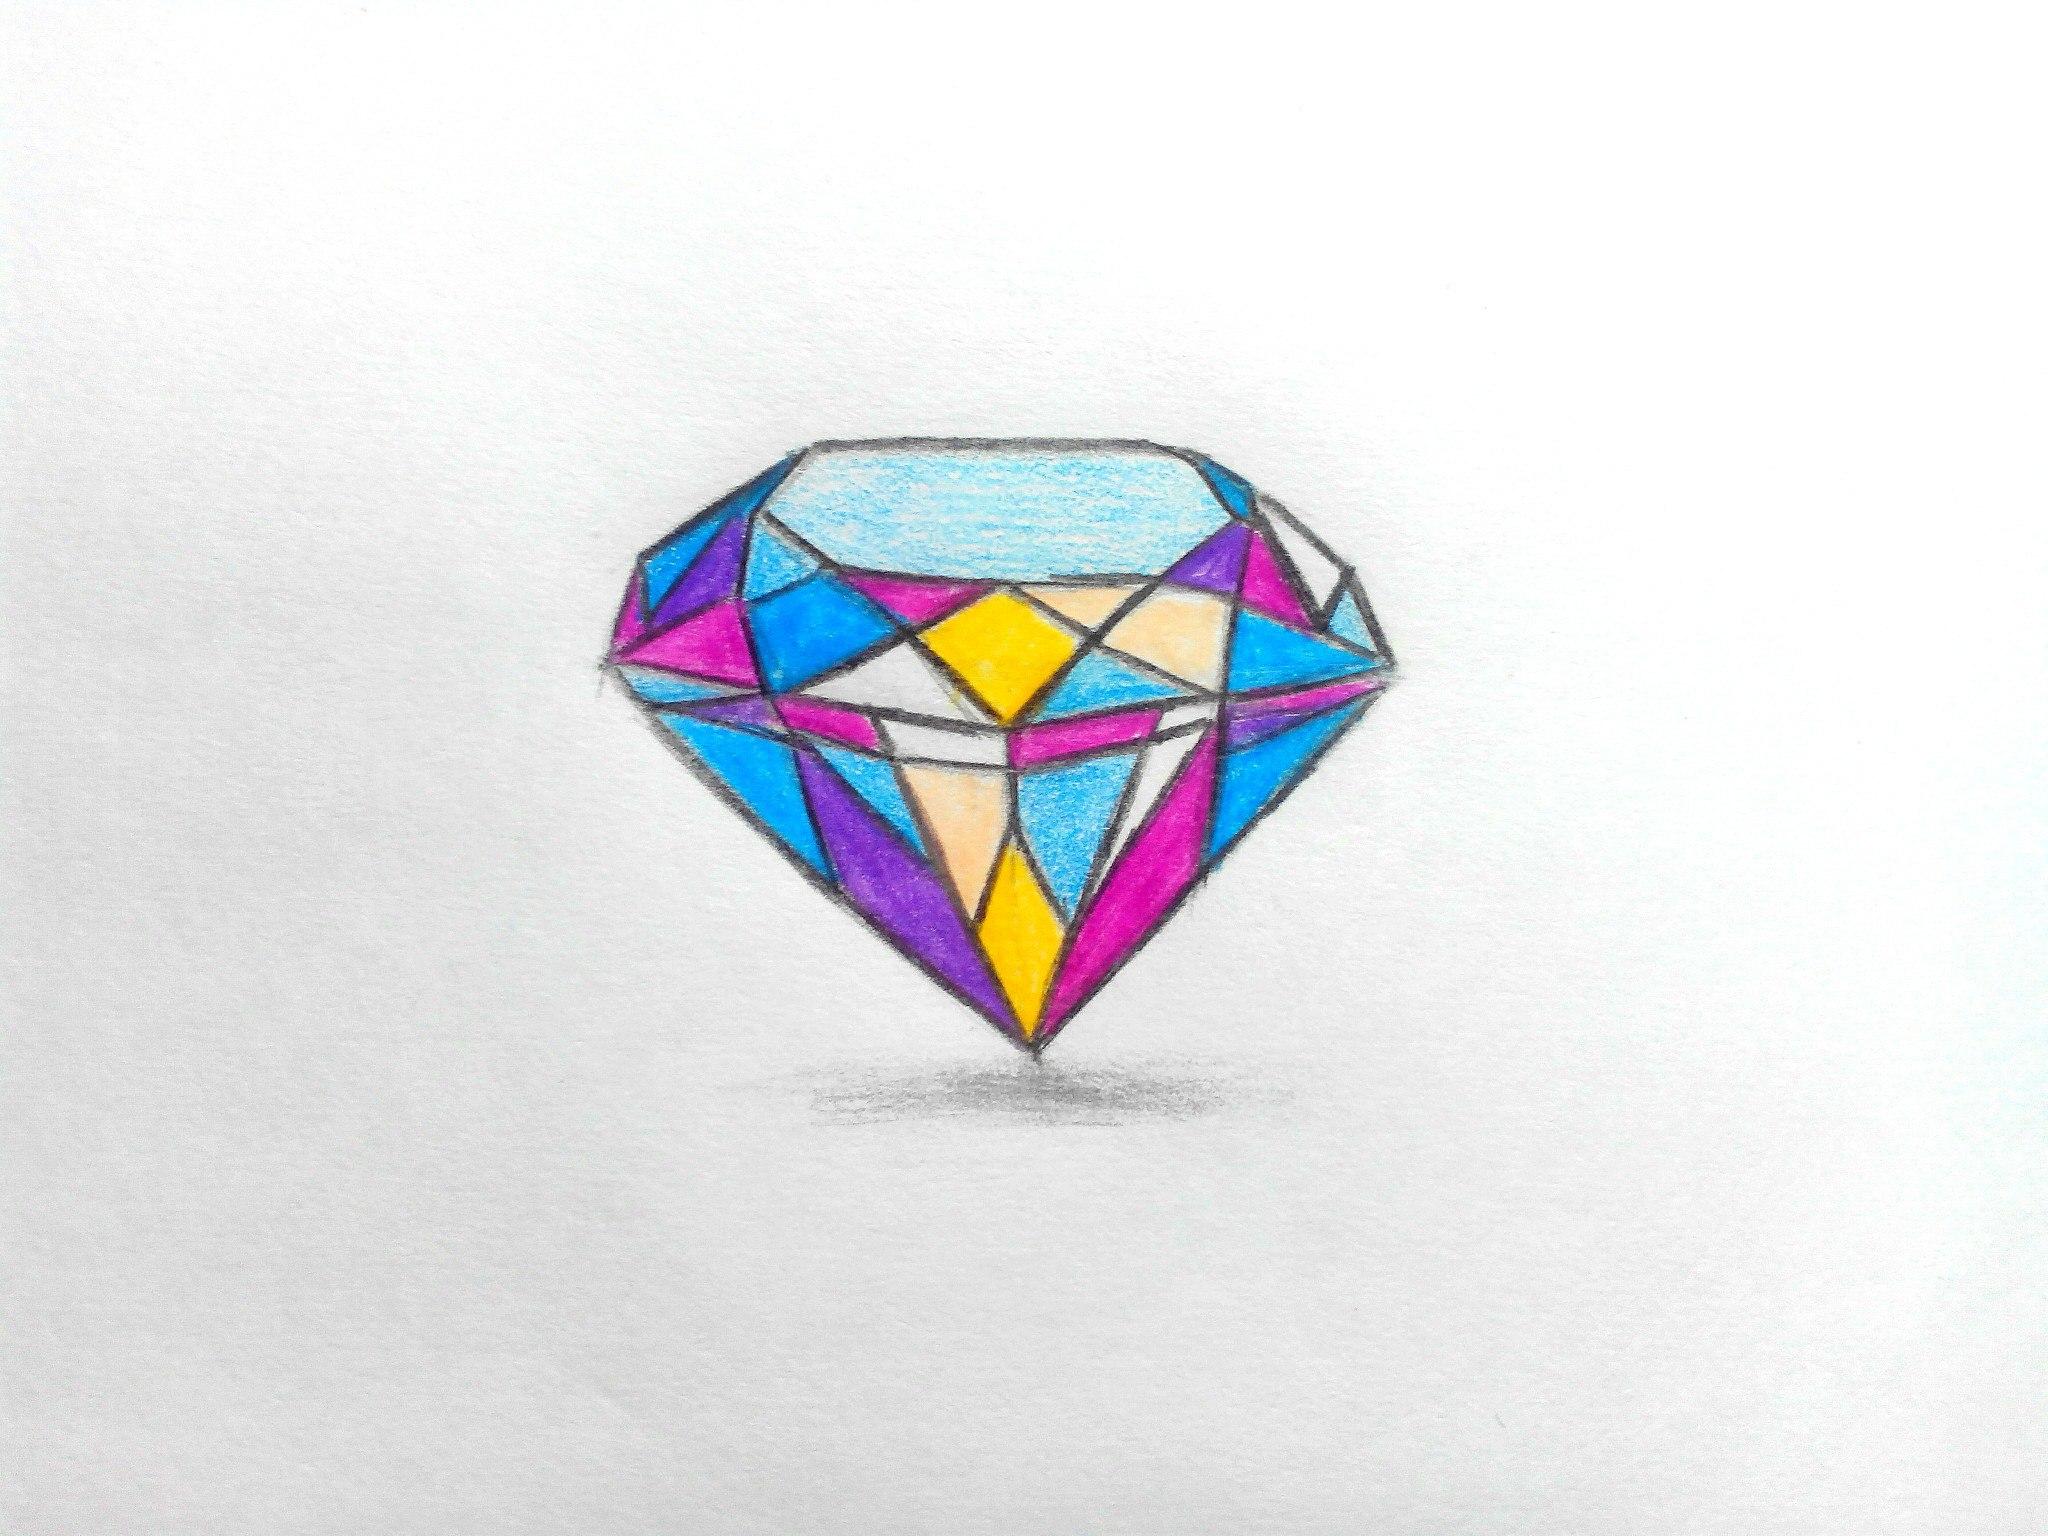 нарисованный алмаз